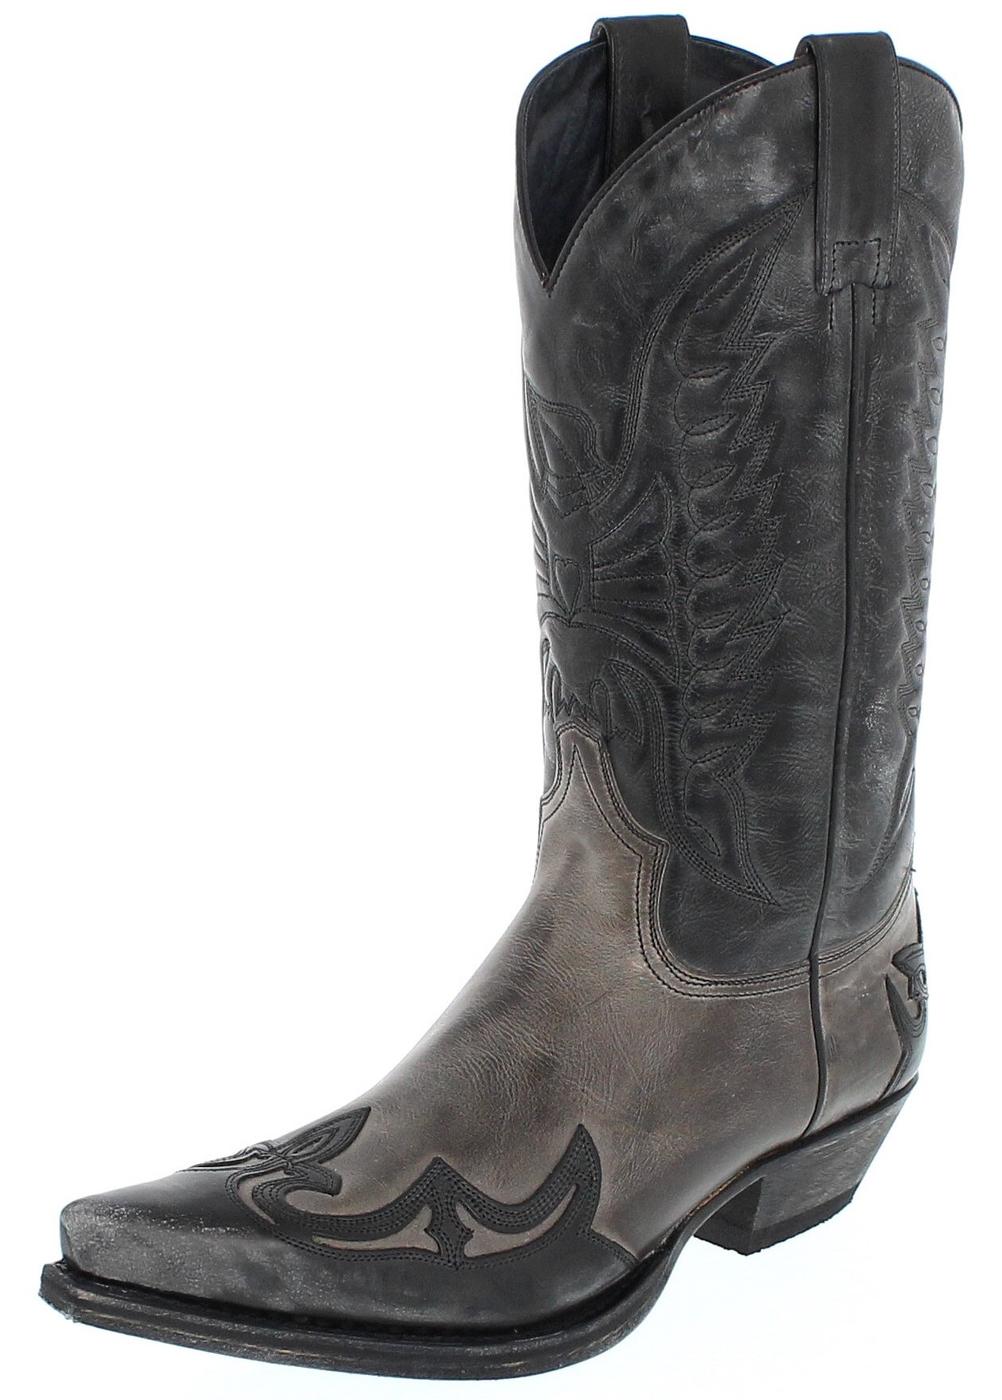 Sendra Boots 13170 Negro Grigio Western boot  - black grey